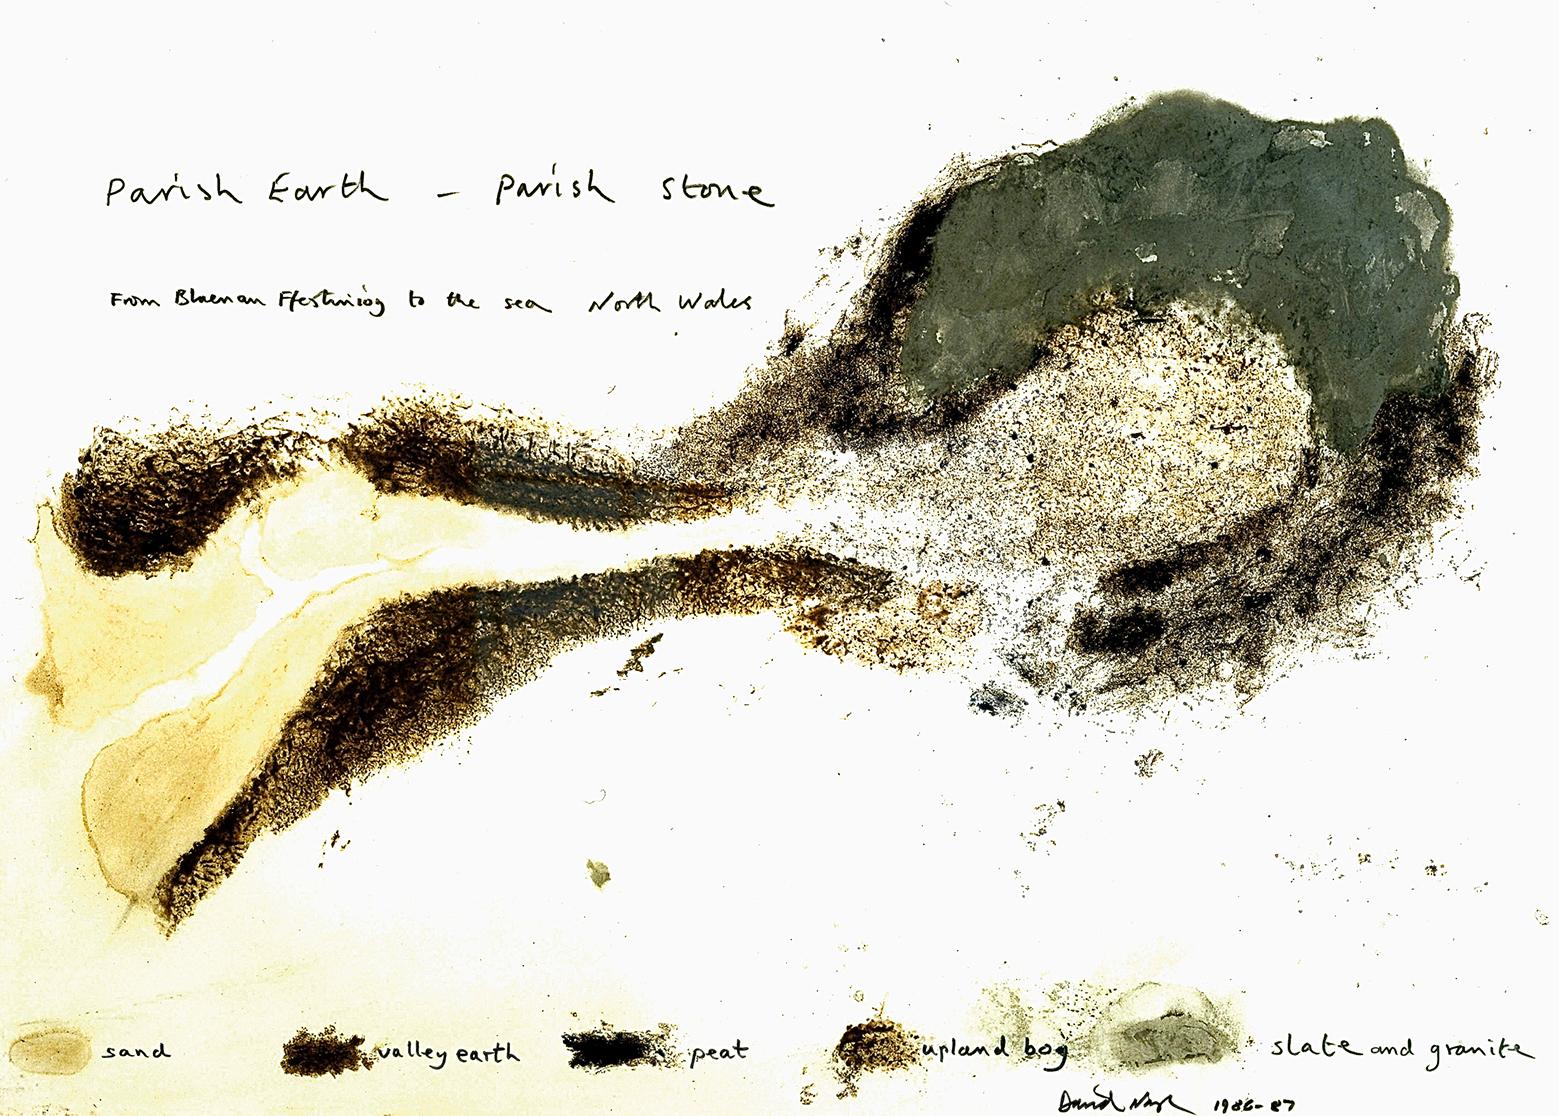 Parish Earth - Parish Stone (North Wales) by David Nash 1986-87 copy